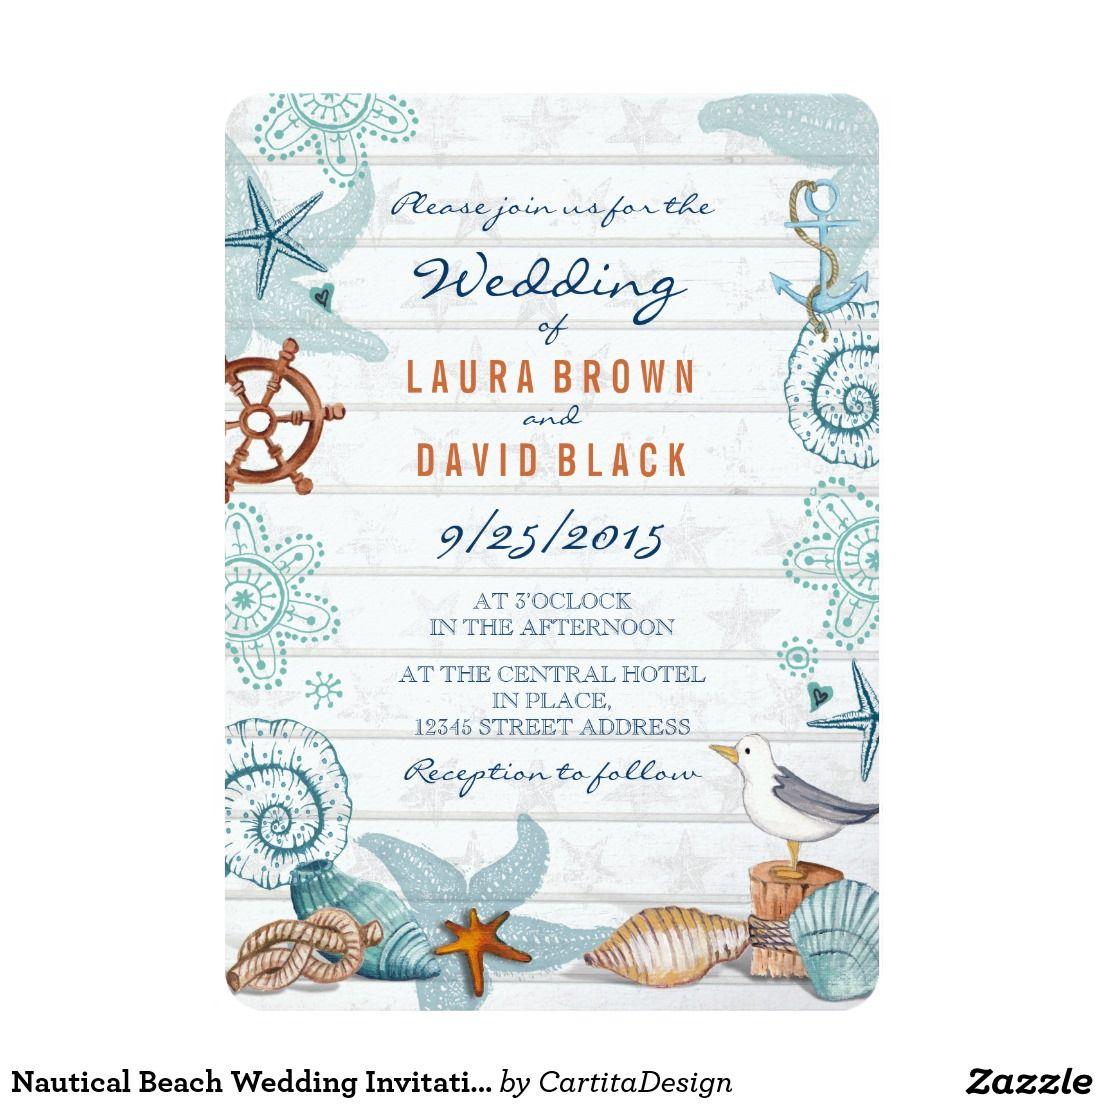 Nautical Beach Wedding Invitation | Beach Wedding Invitations ...